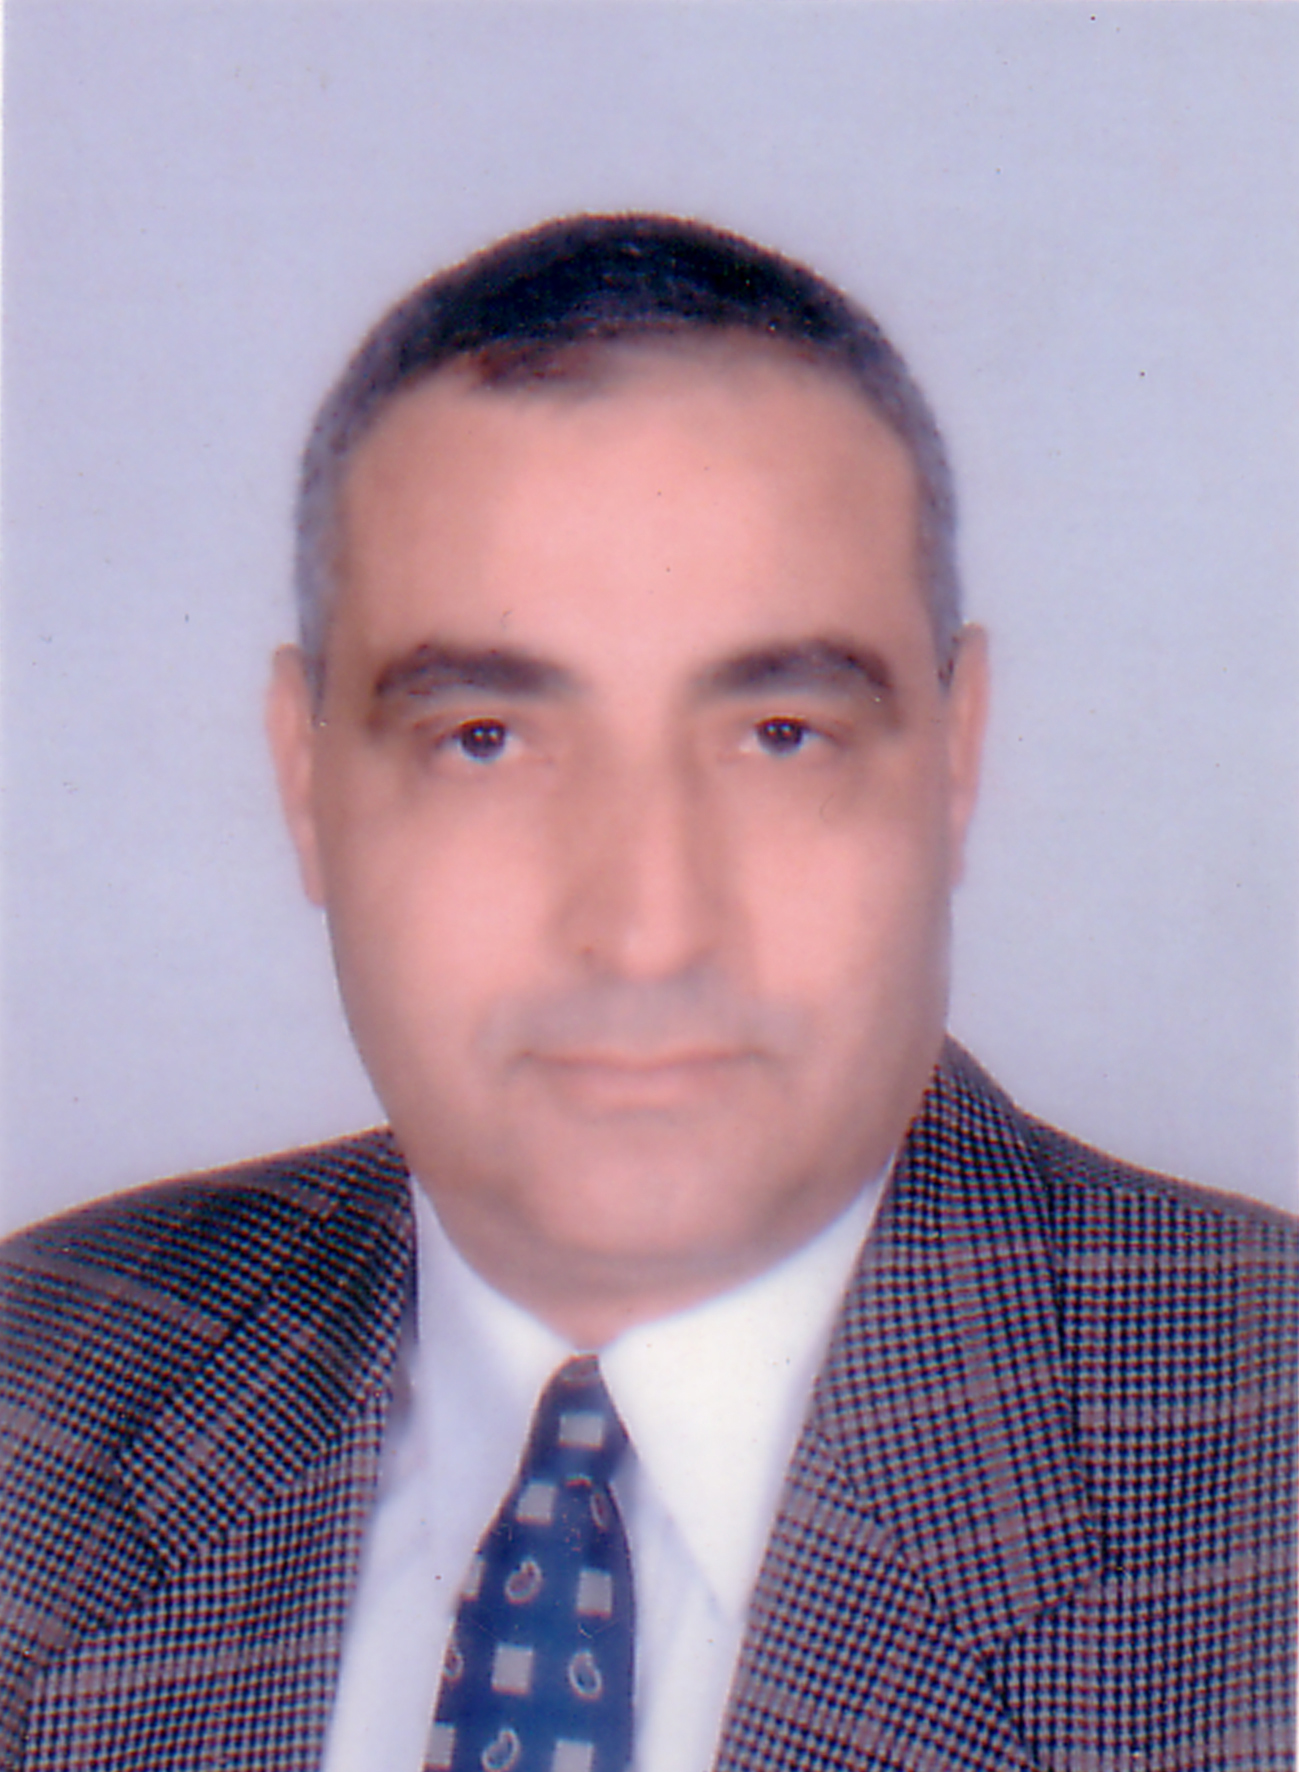 Mohamed Hussein Mostafa Ahmed